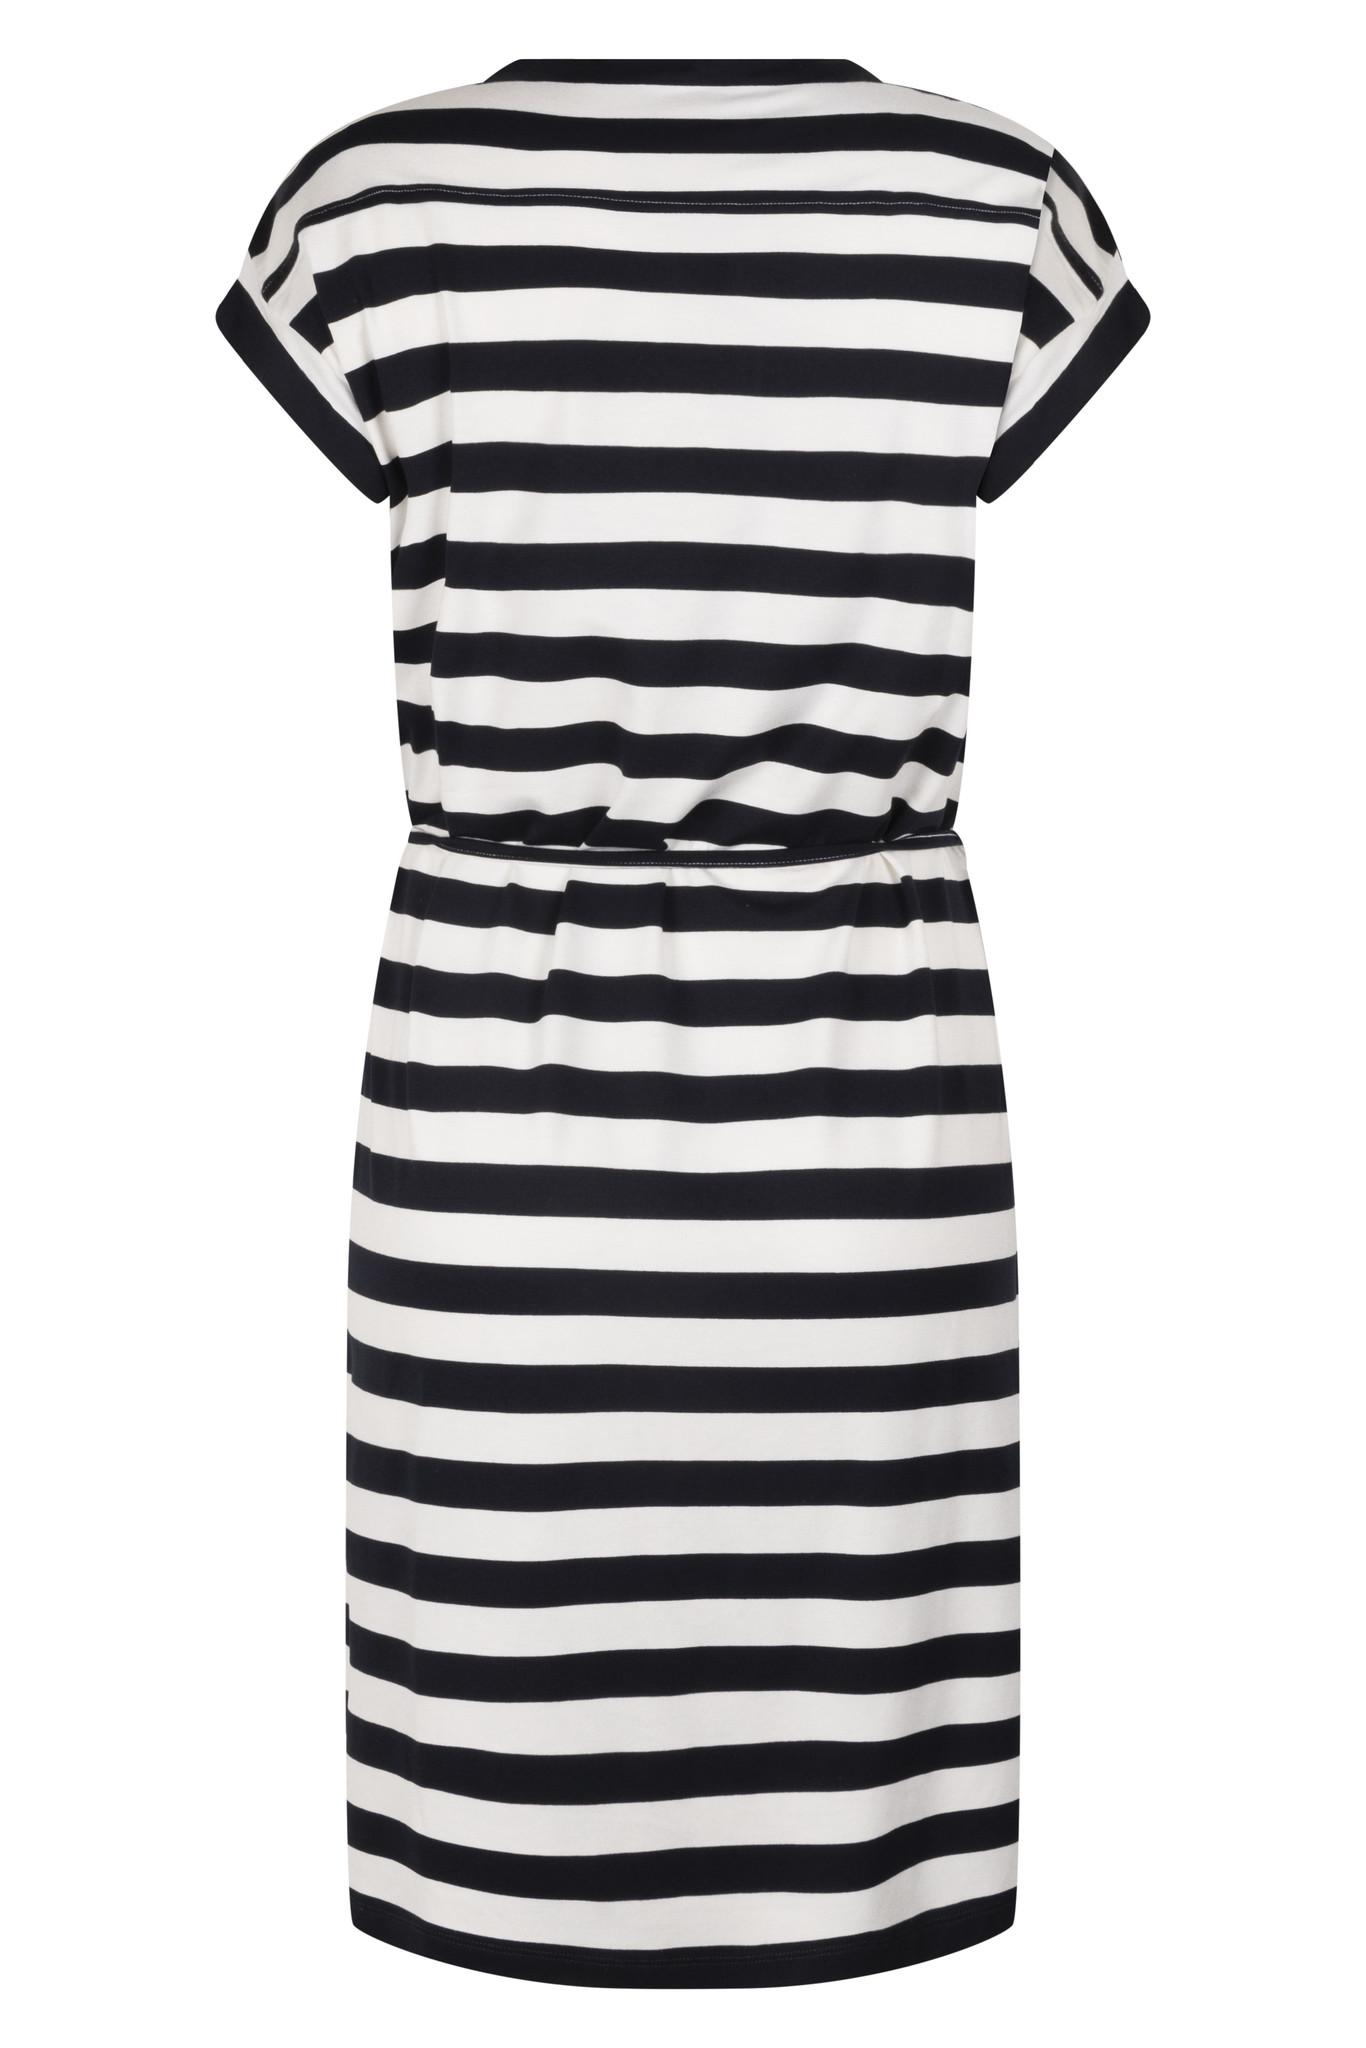 Zoso Zoso Amee striped dress navy/white